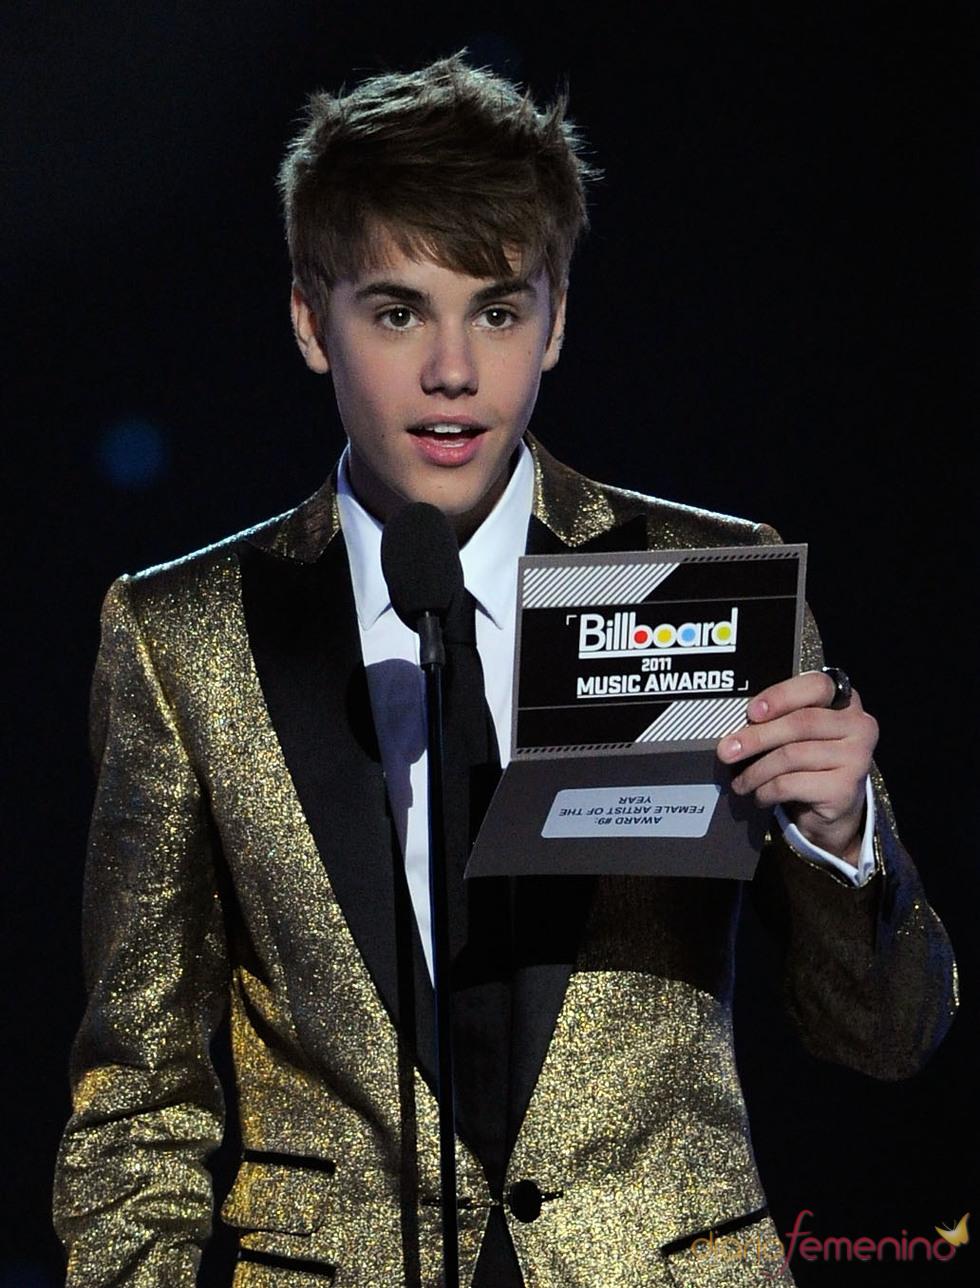 Justin Bieber presenta un Billboard Music Awards 2011